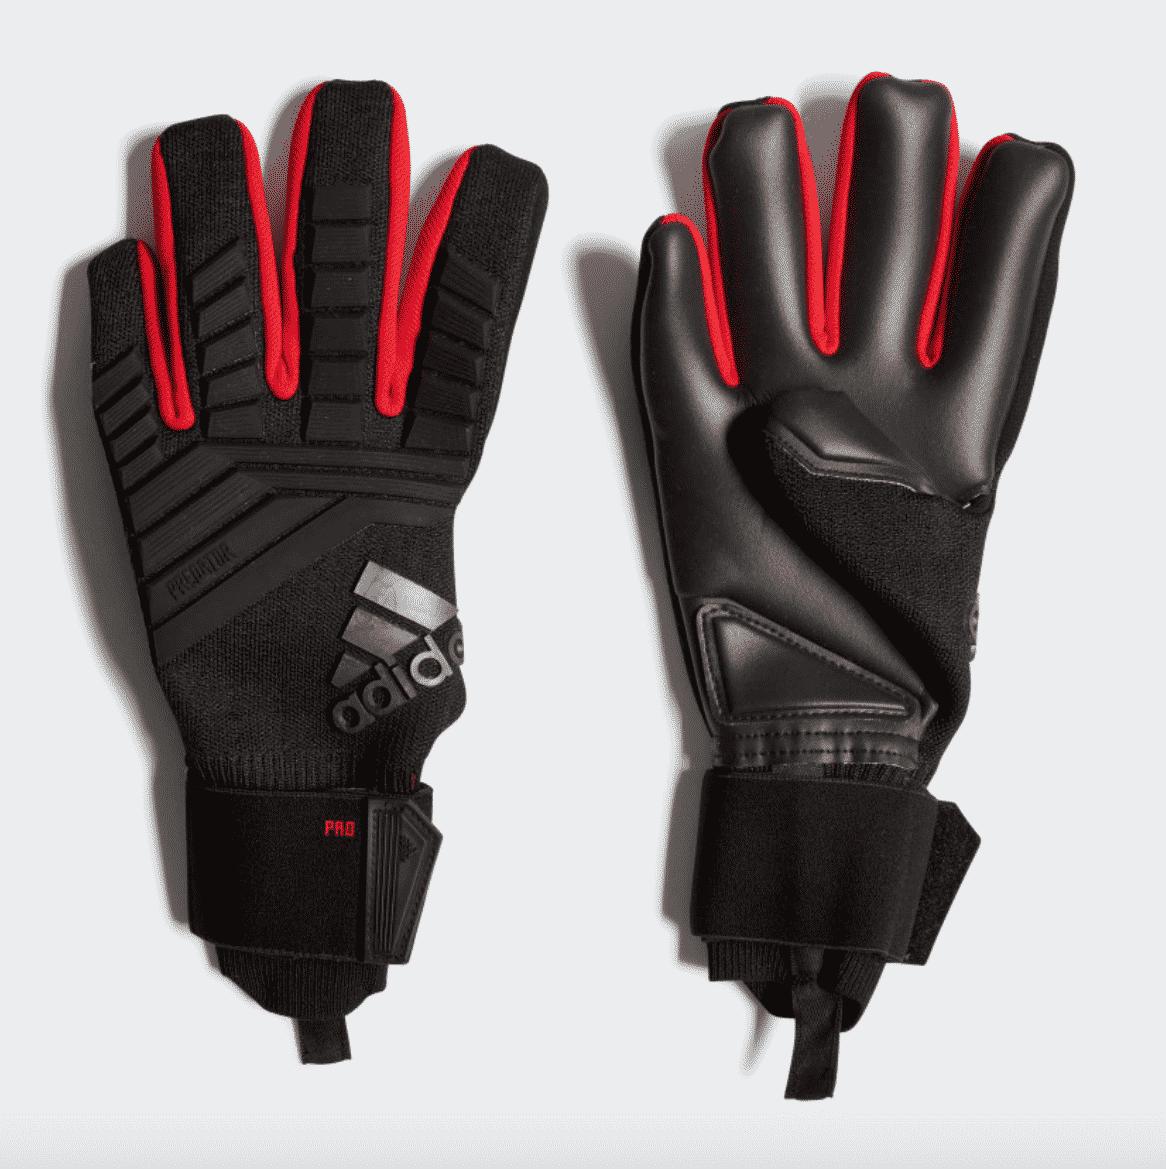 gants-adidas-preadator-pro-archetic-pack